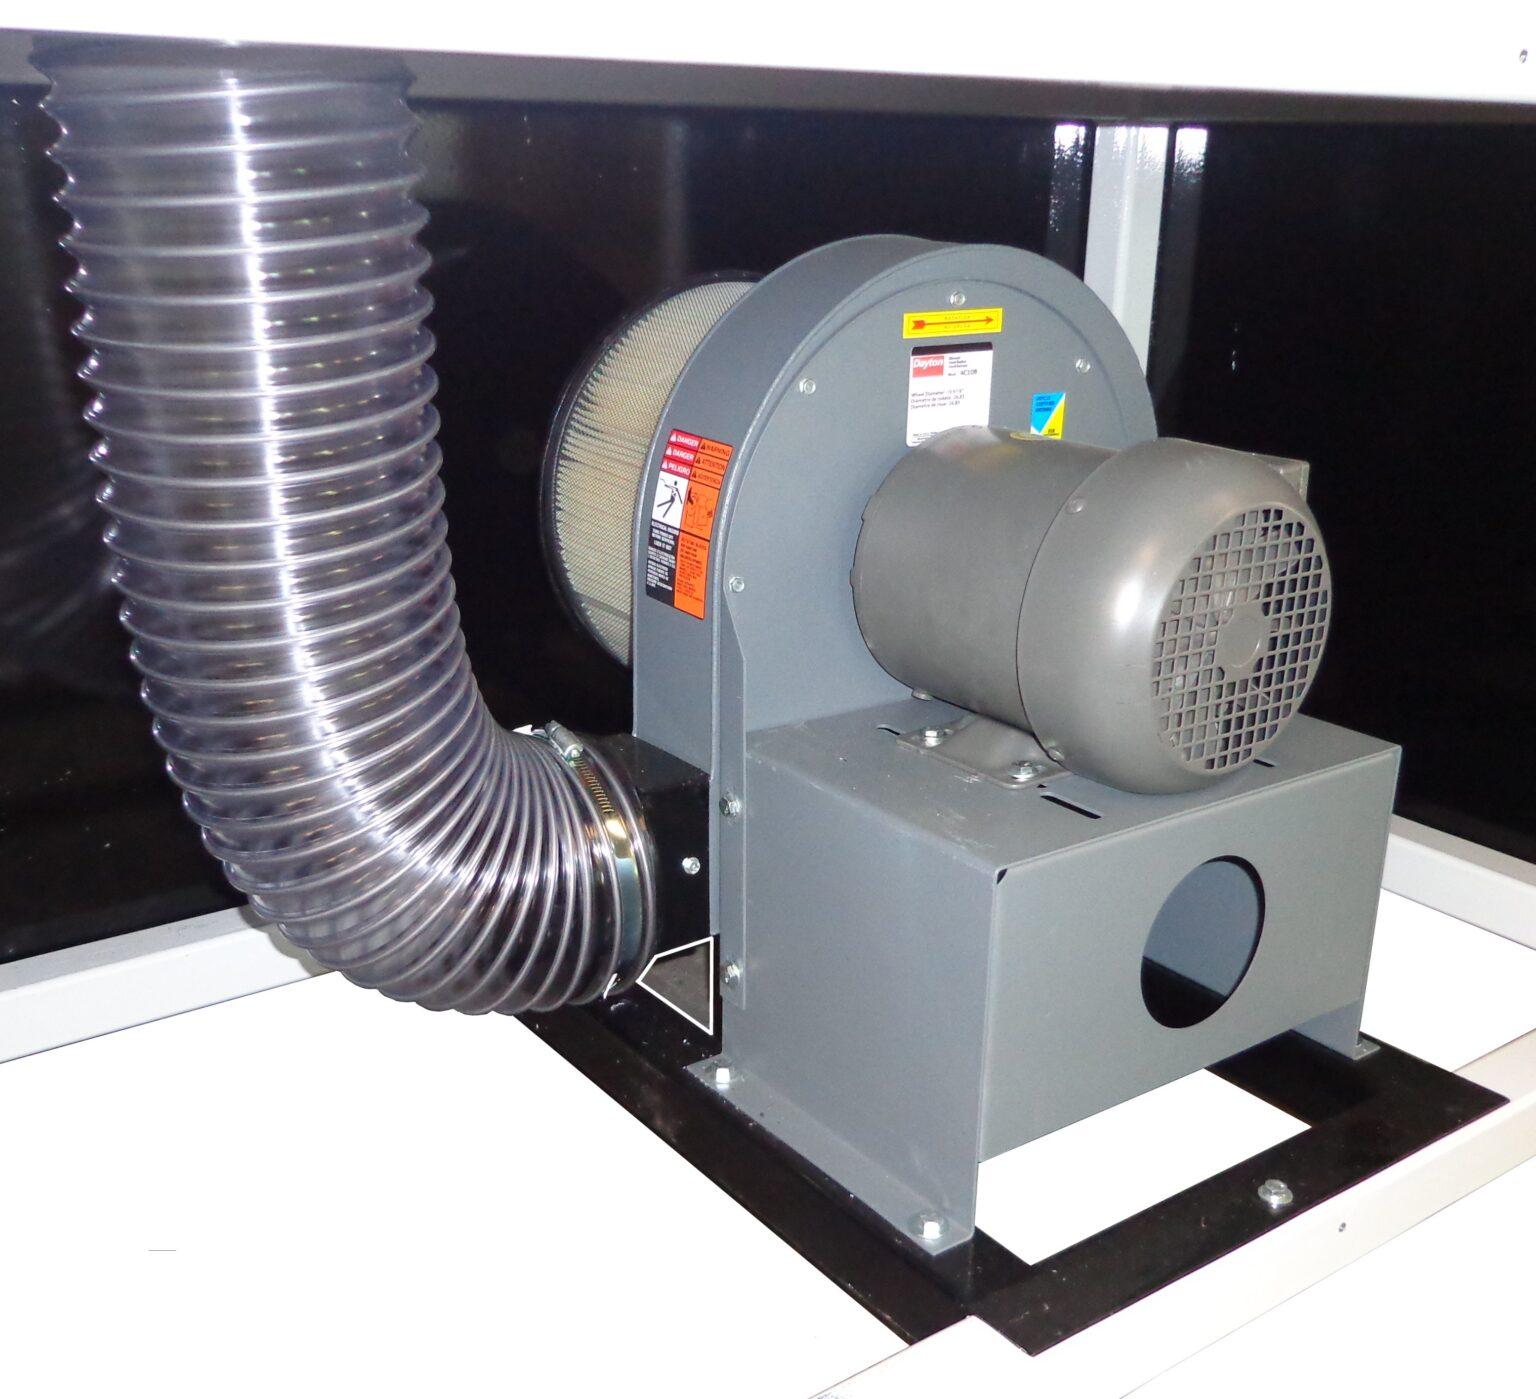 3-Phase High Pressure Blower System 6″ Diameter Air Hose Serviceable Air Filter